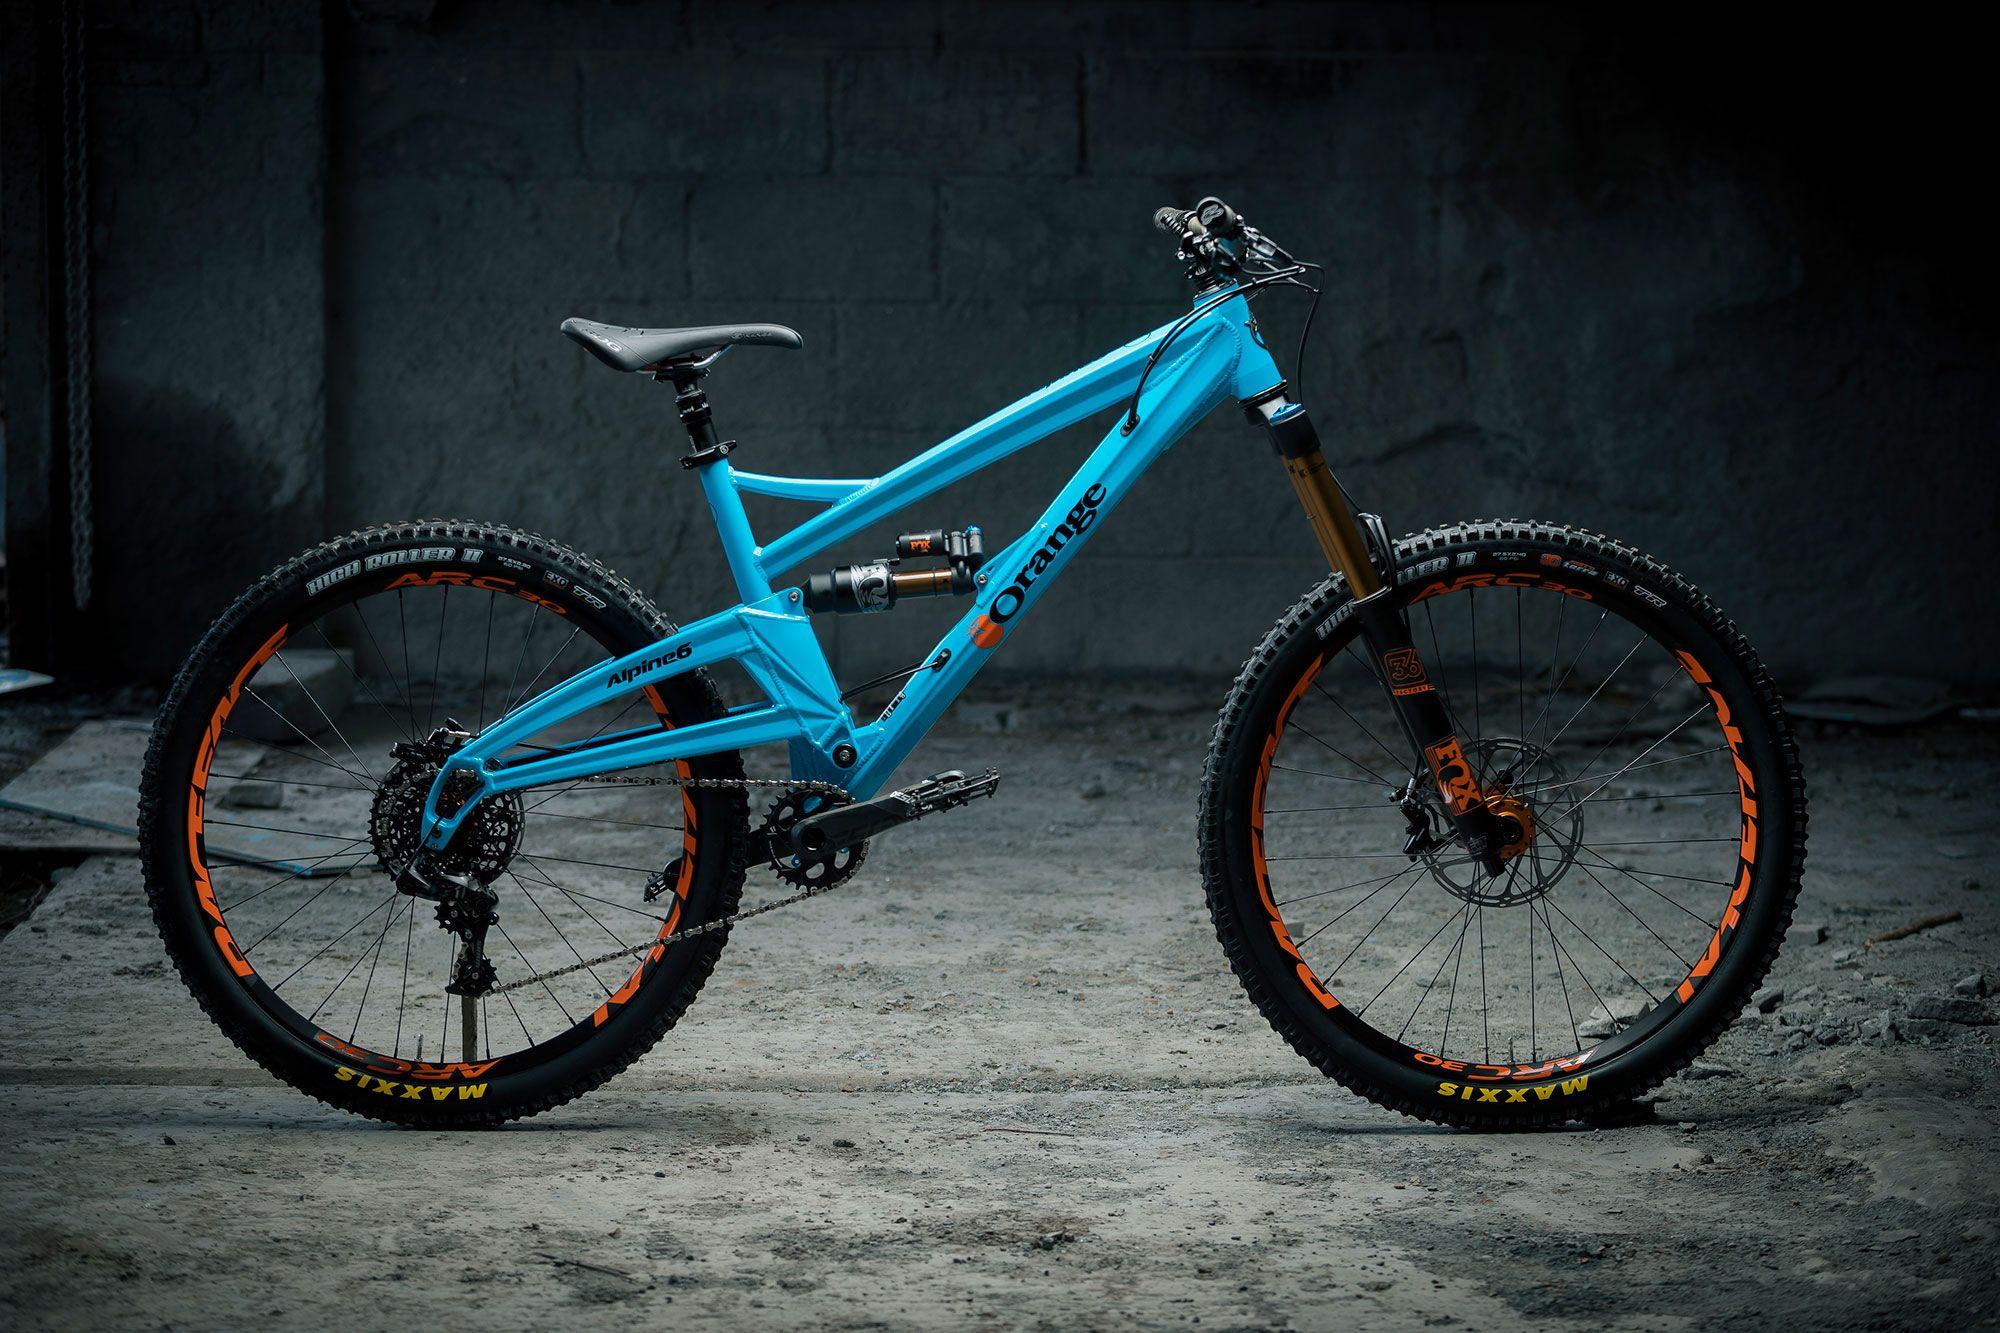 2000 1333 Diamondback Mountain Bike Orange Mountain Bike Best